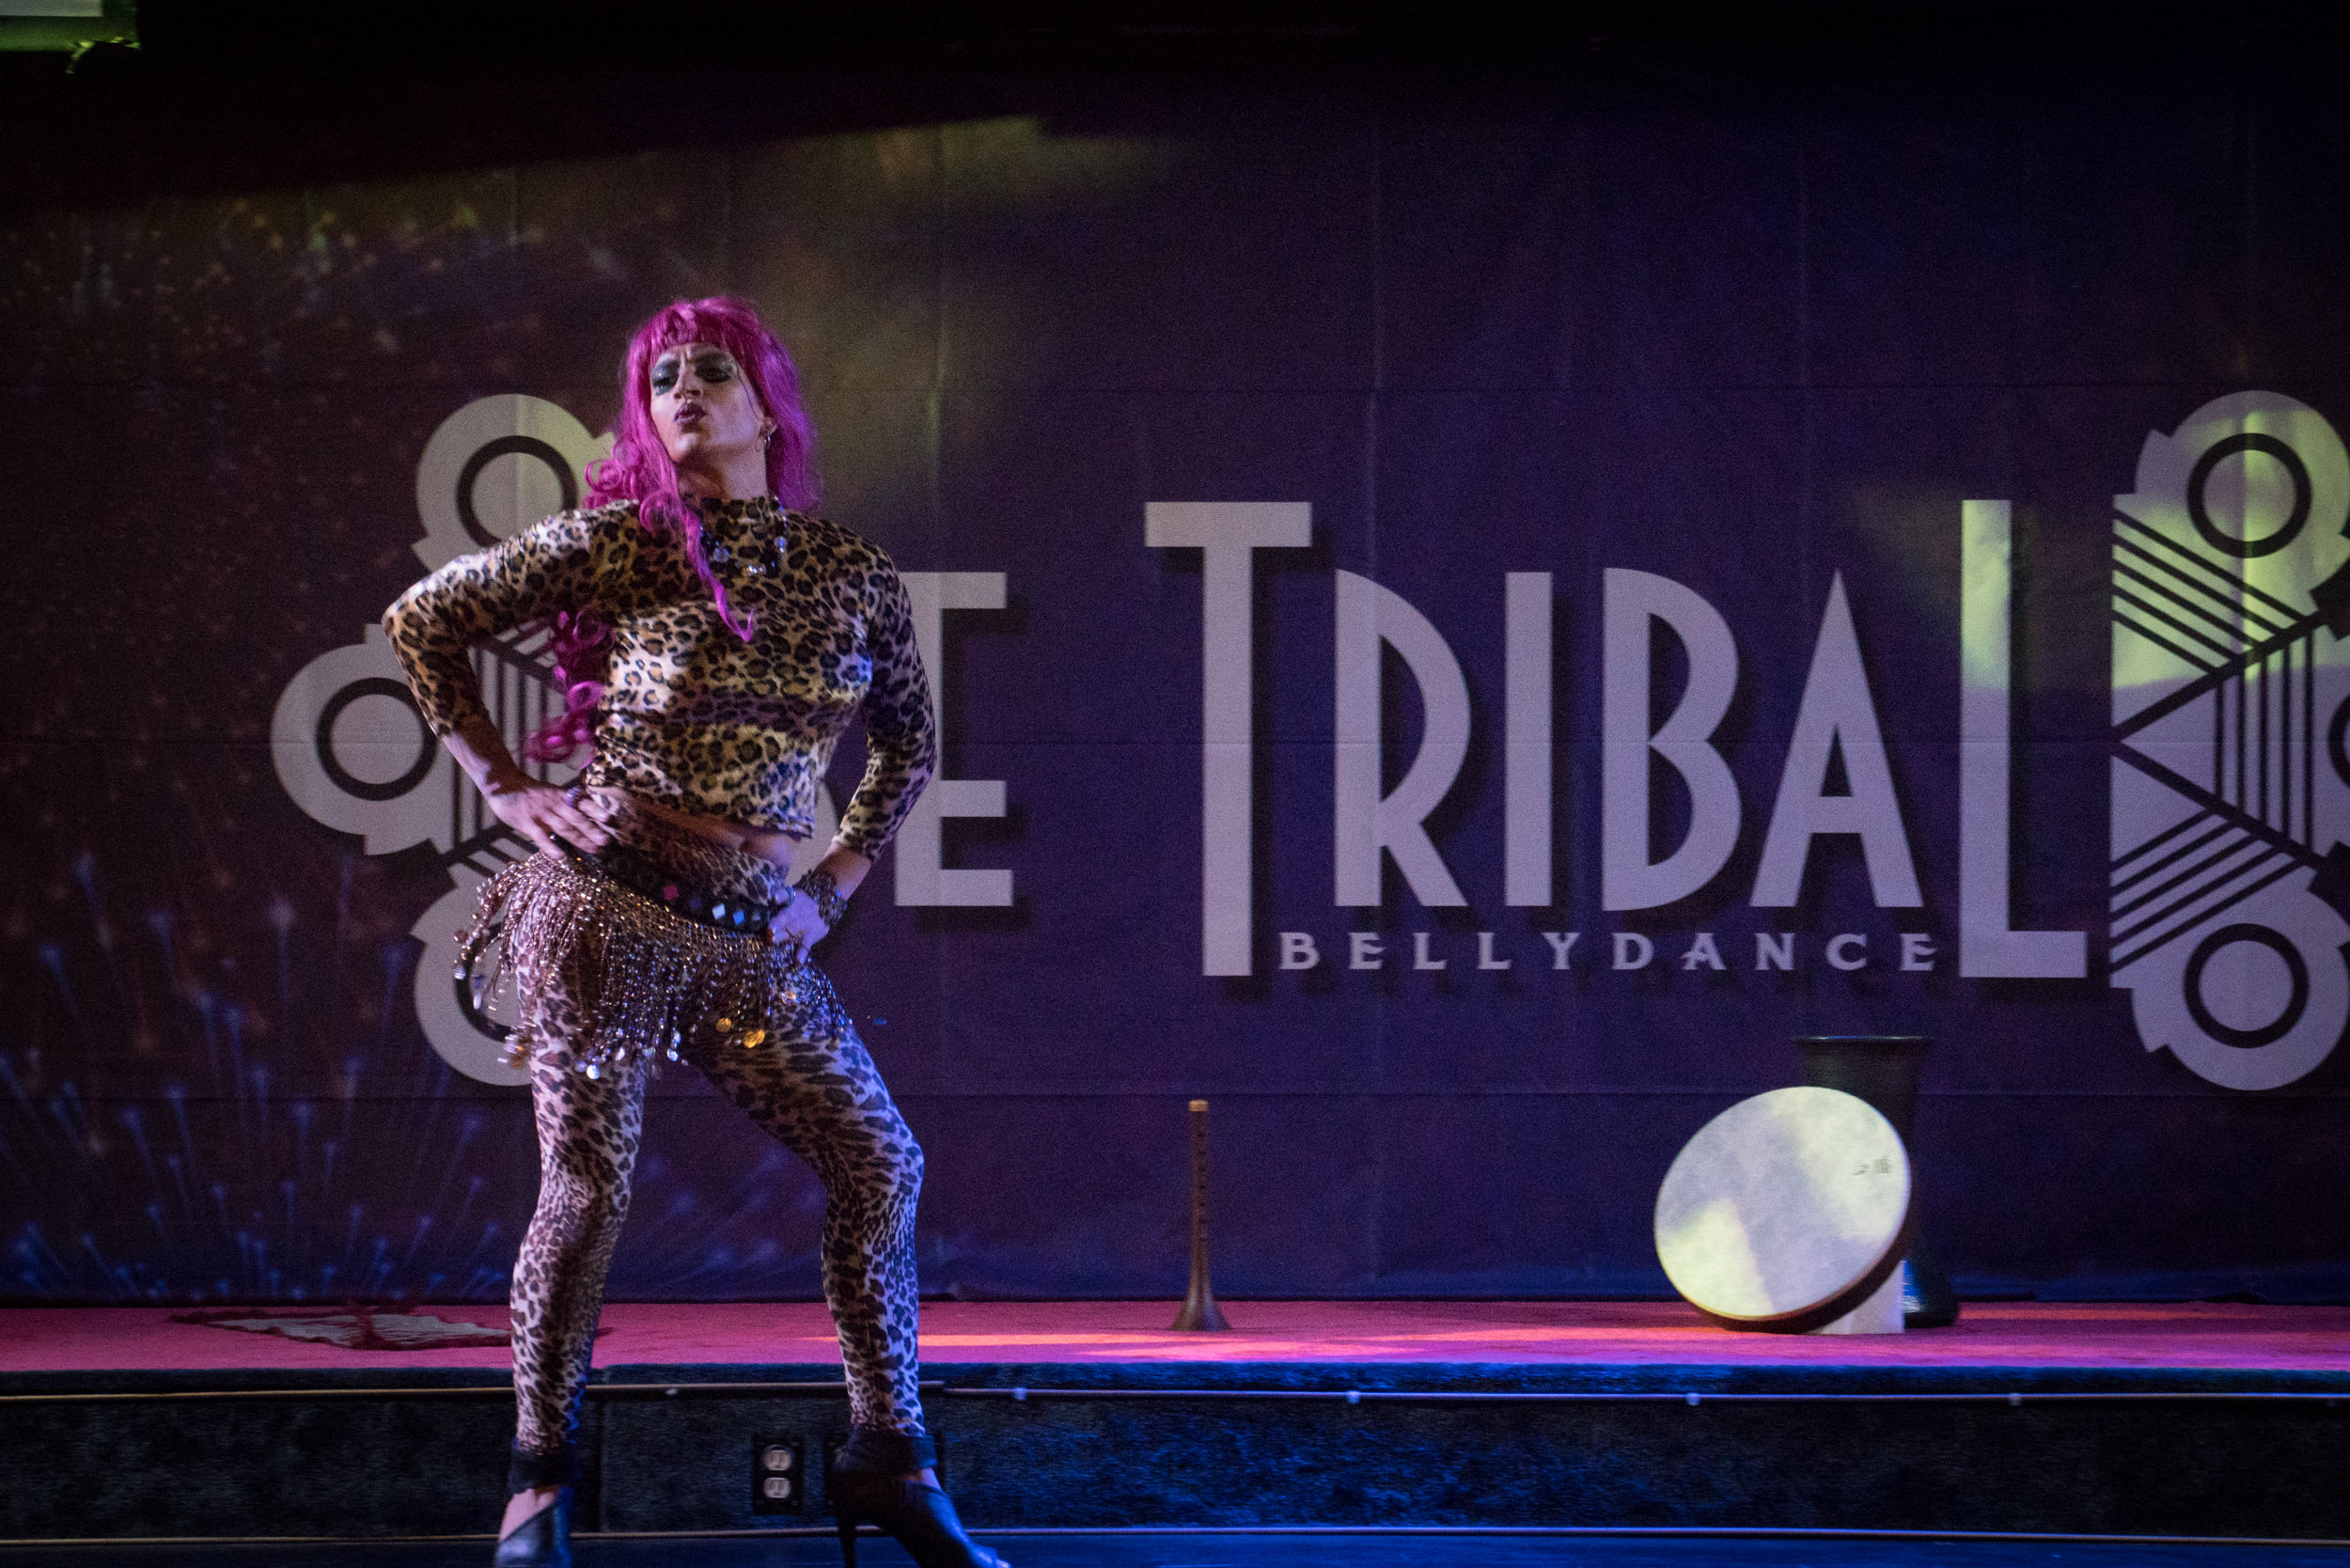 Be Tribal Bellydance 2018 A06